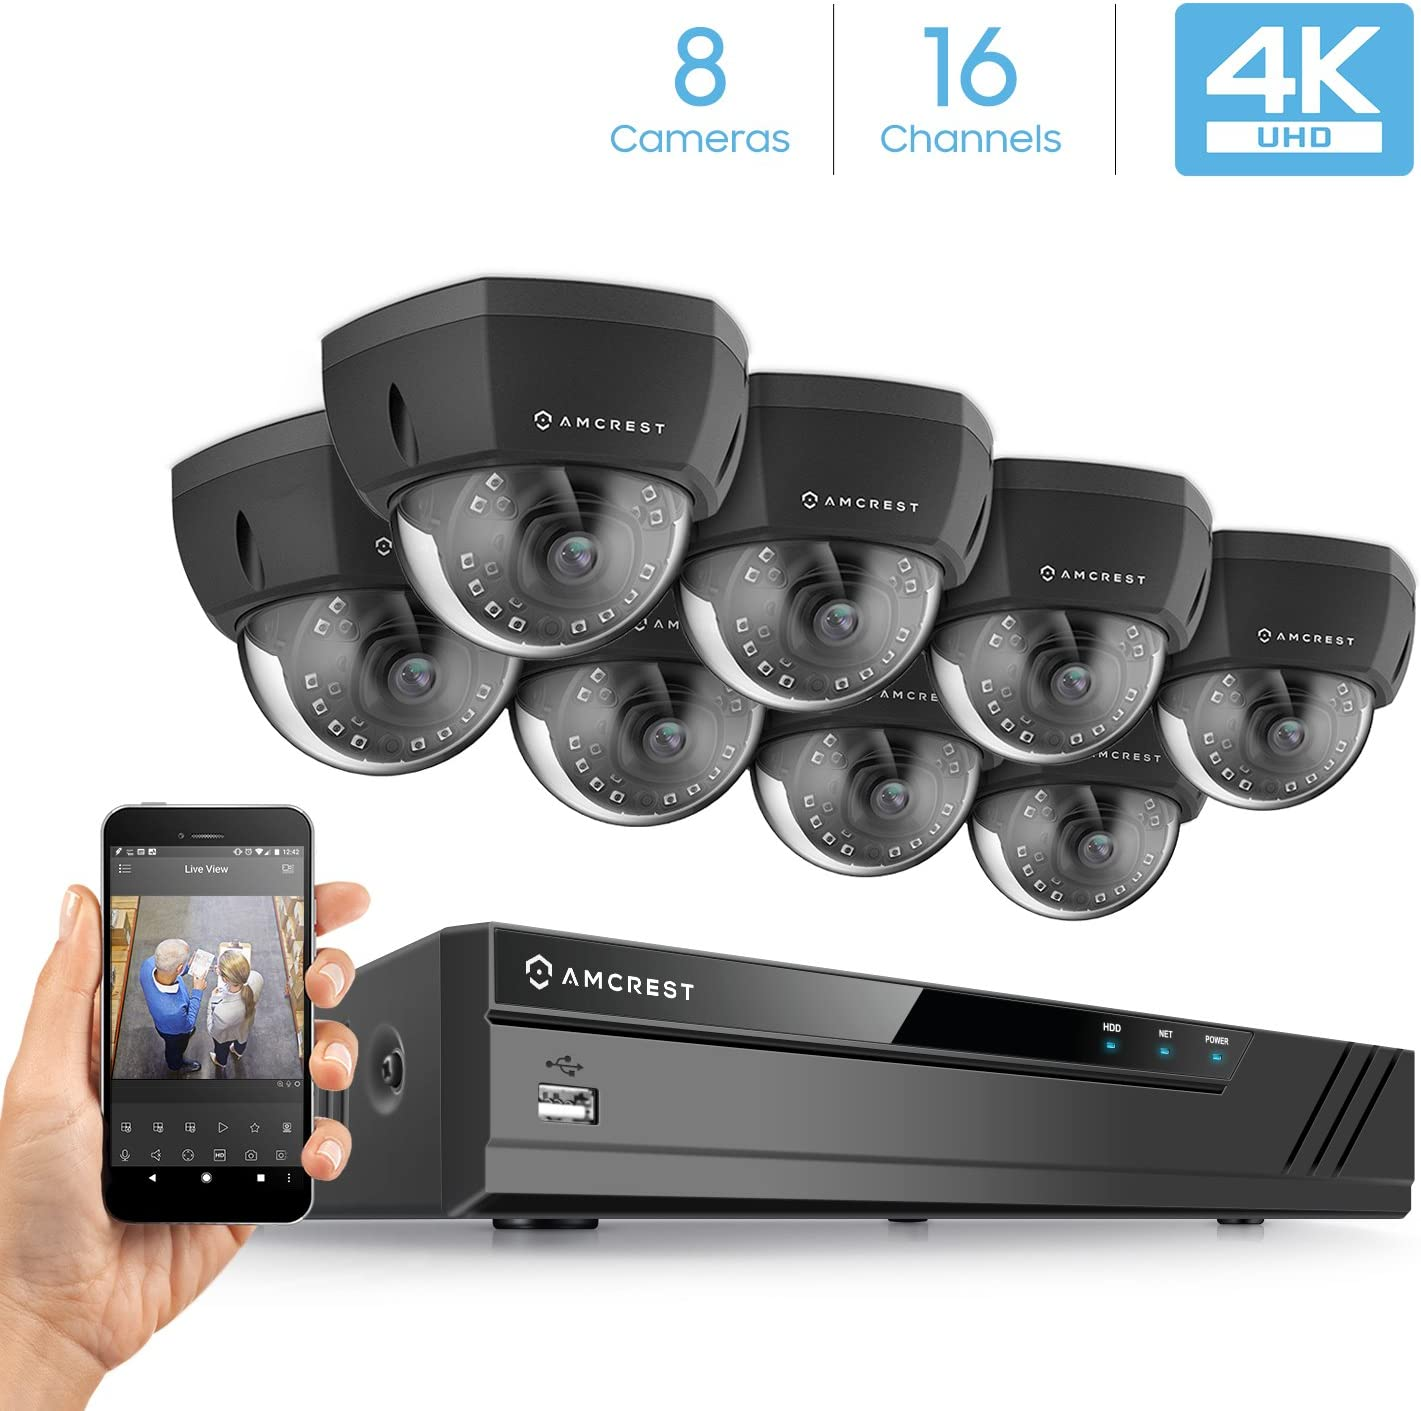 Amcrest 4K Security Camera System w 4K 16CH 8-Port PoE NVR, 8 x 4K 8MP IP67 Weatherproof Metal Dome POE IP Cameras 3840×2160 , 2.8mm Wide Angle Lens, NV4116E-HS-IP8M-2493EB8 Black